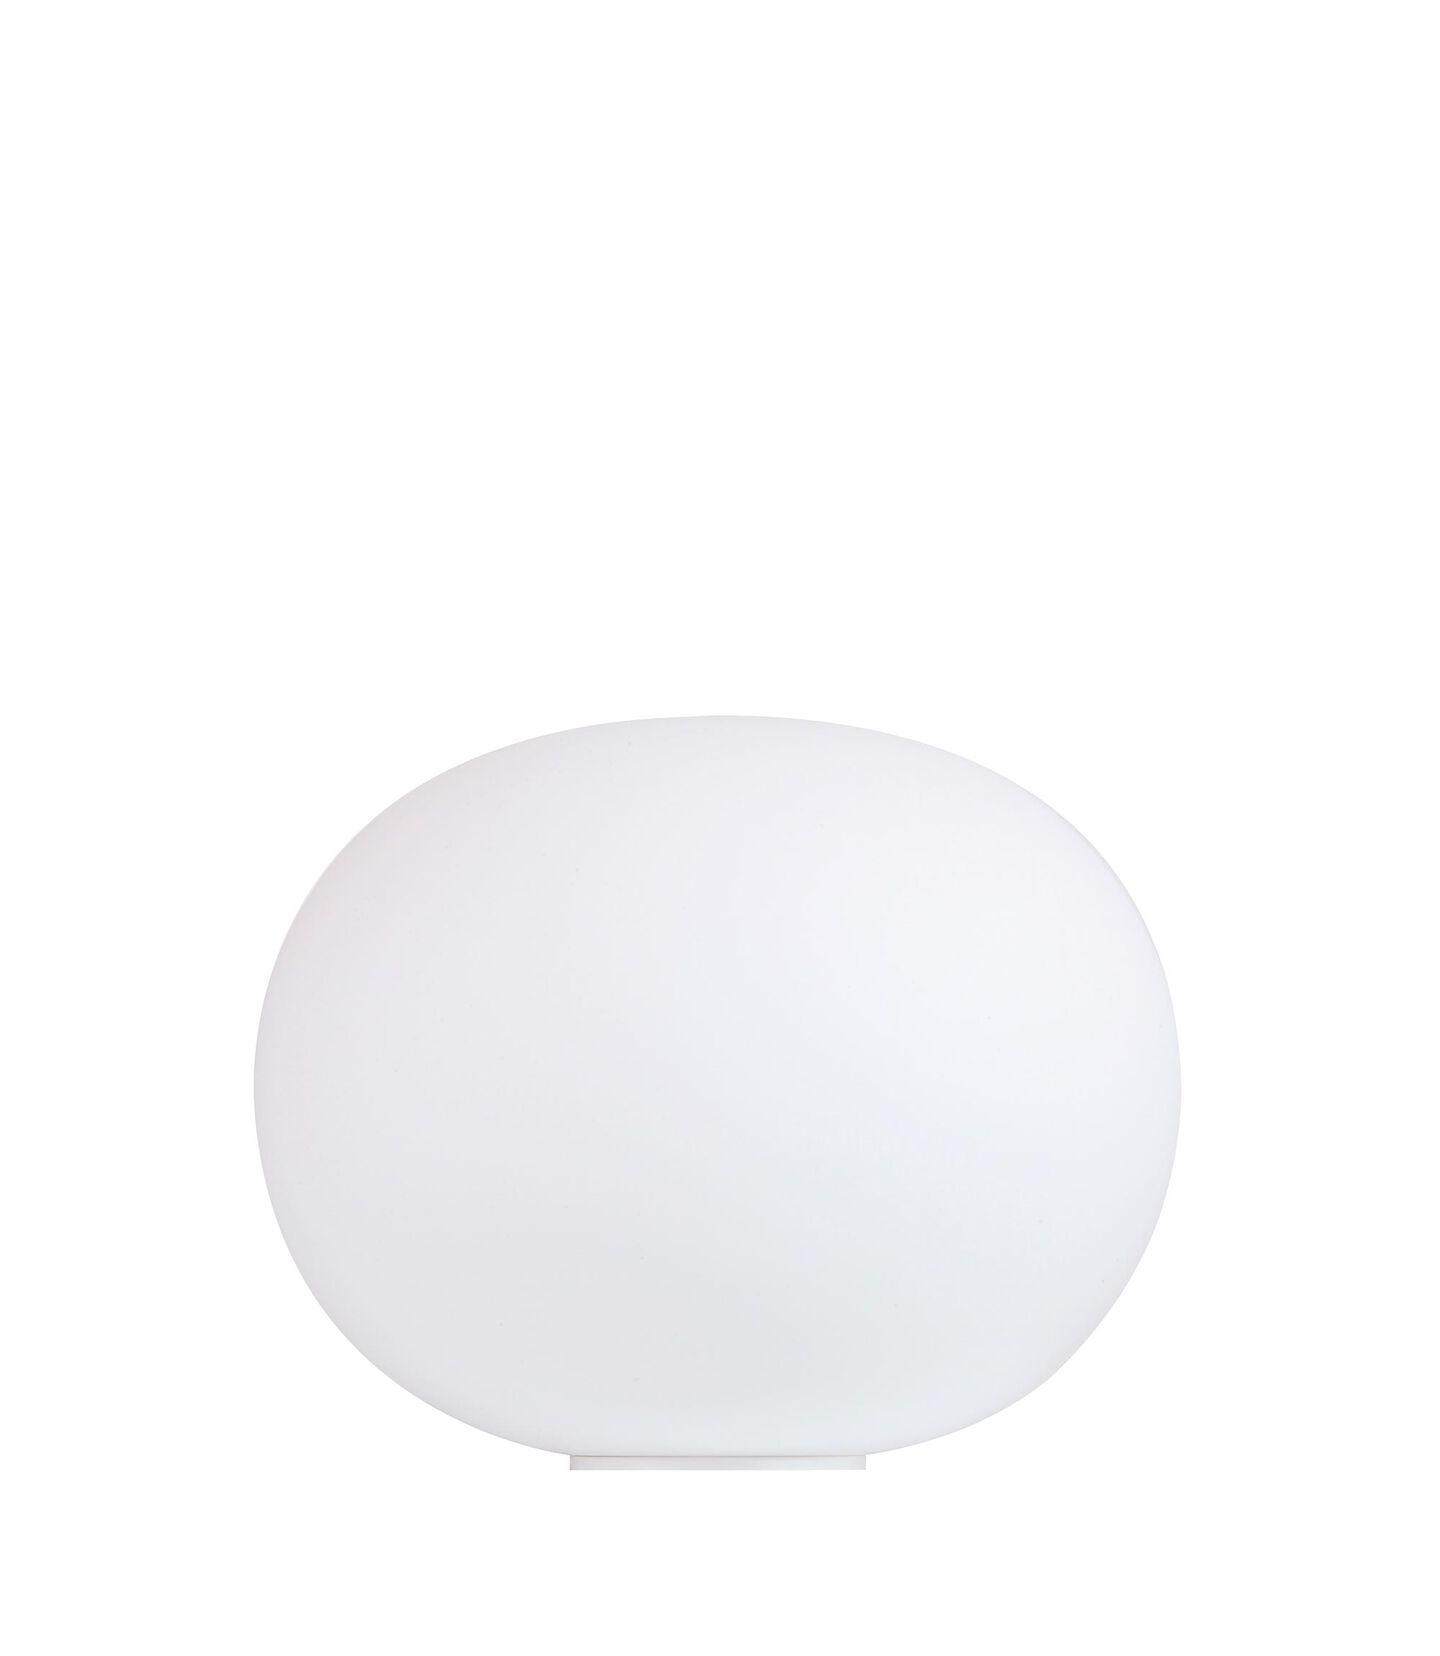 glo-ball-basic-table-2-morrison-flos-F3026000-product-still-life-big-2